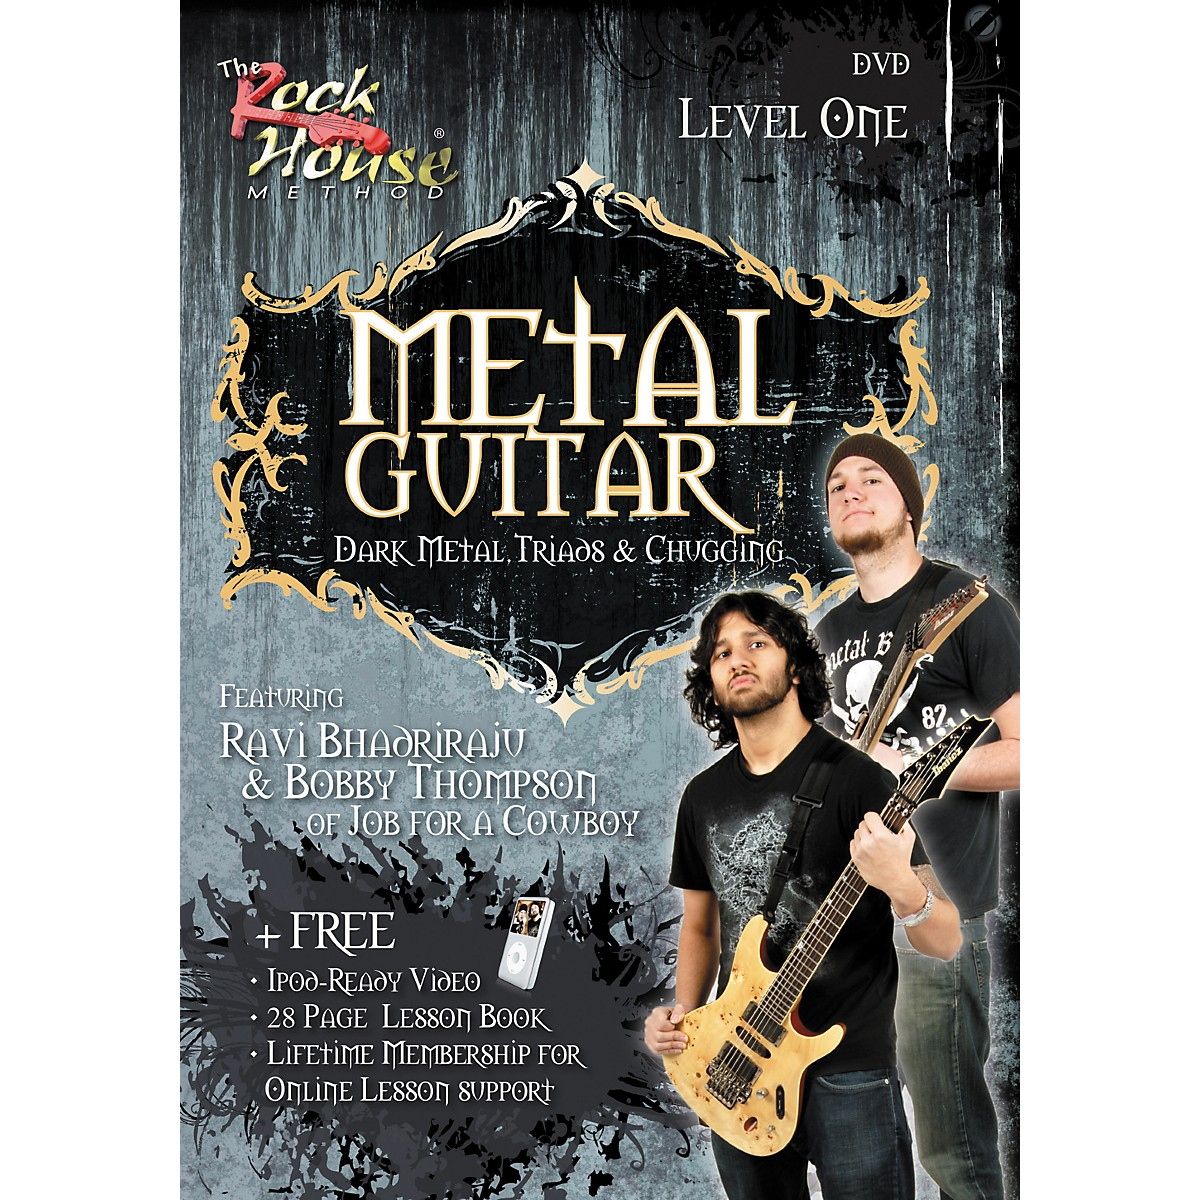 Hal Leonard Metal Guitar - Dark Metal, Triads & Chugging Level 1, Featuring Ravi Bhadriraju and Bobby Thompson (DVD)